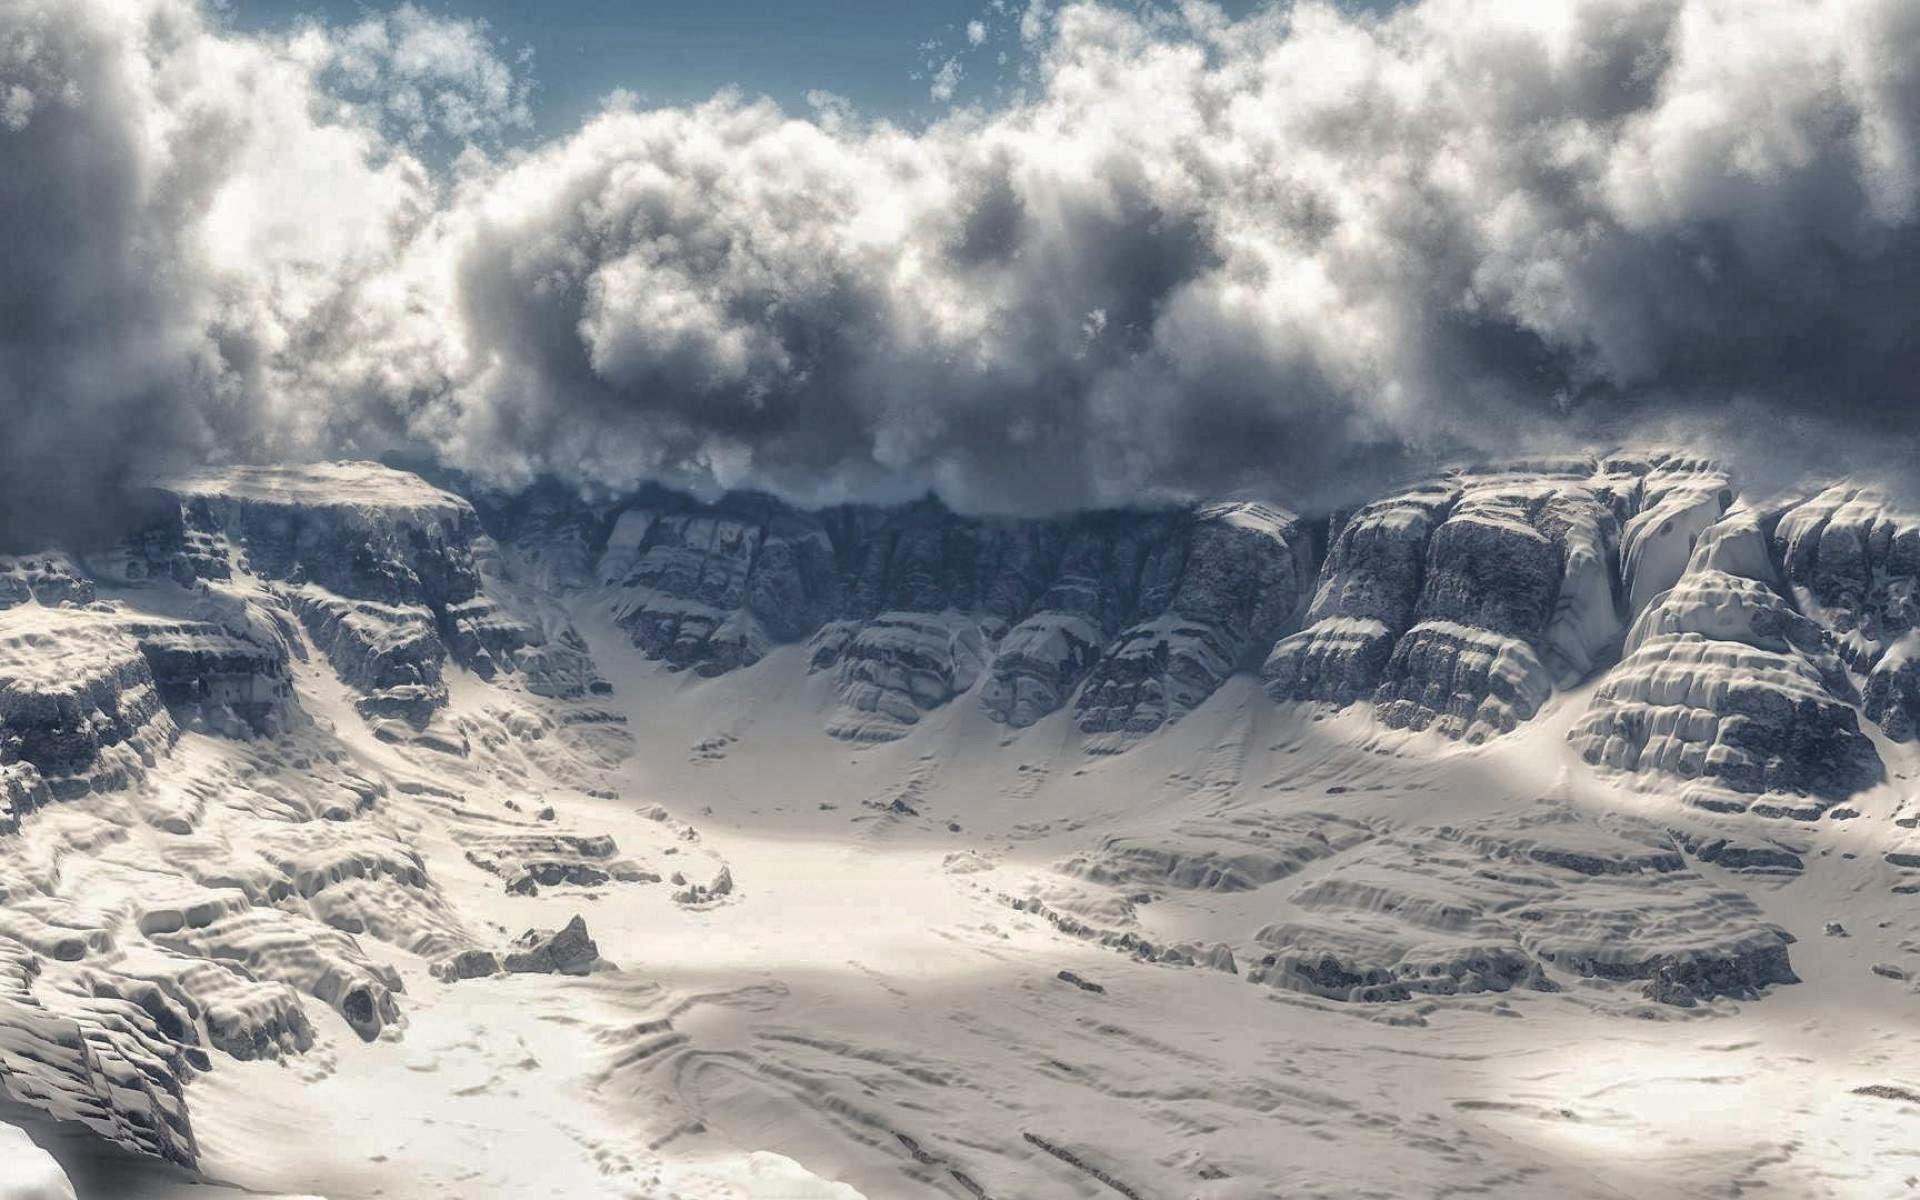 snowfall wallpaper desktop 1080p - photo #22